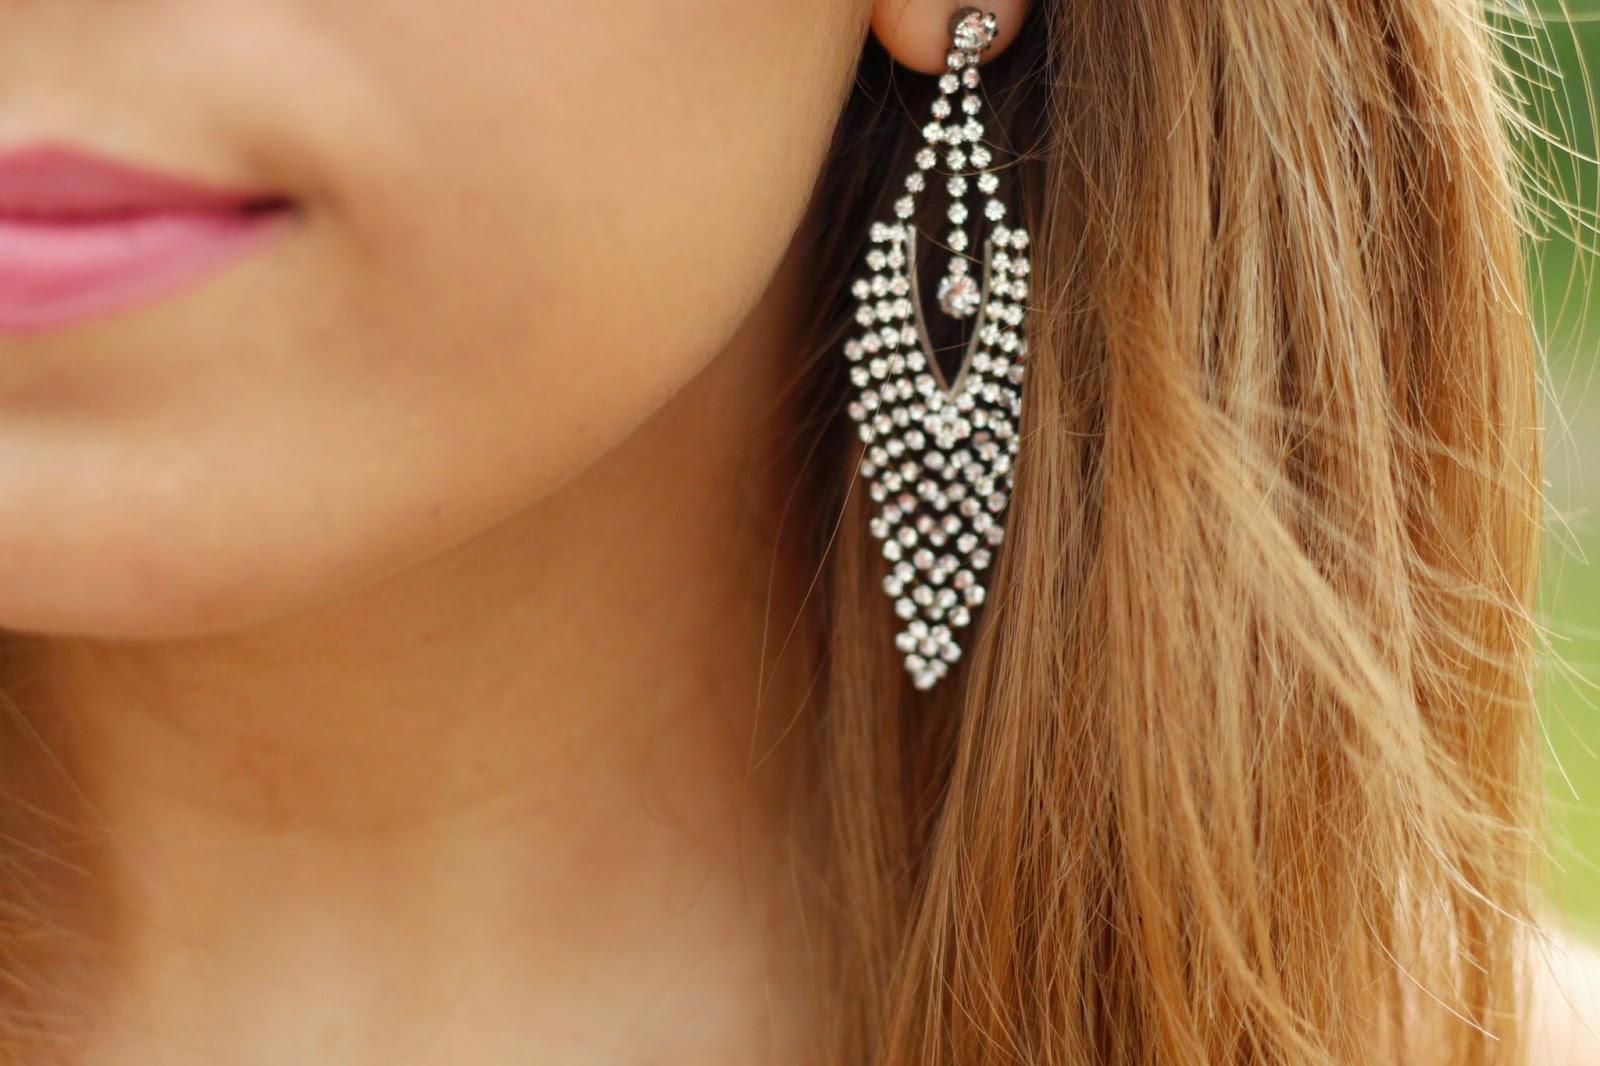 shinny earing